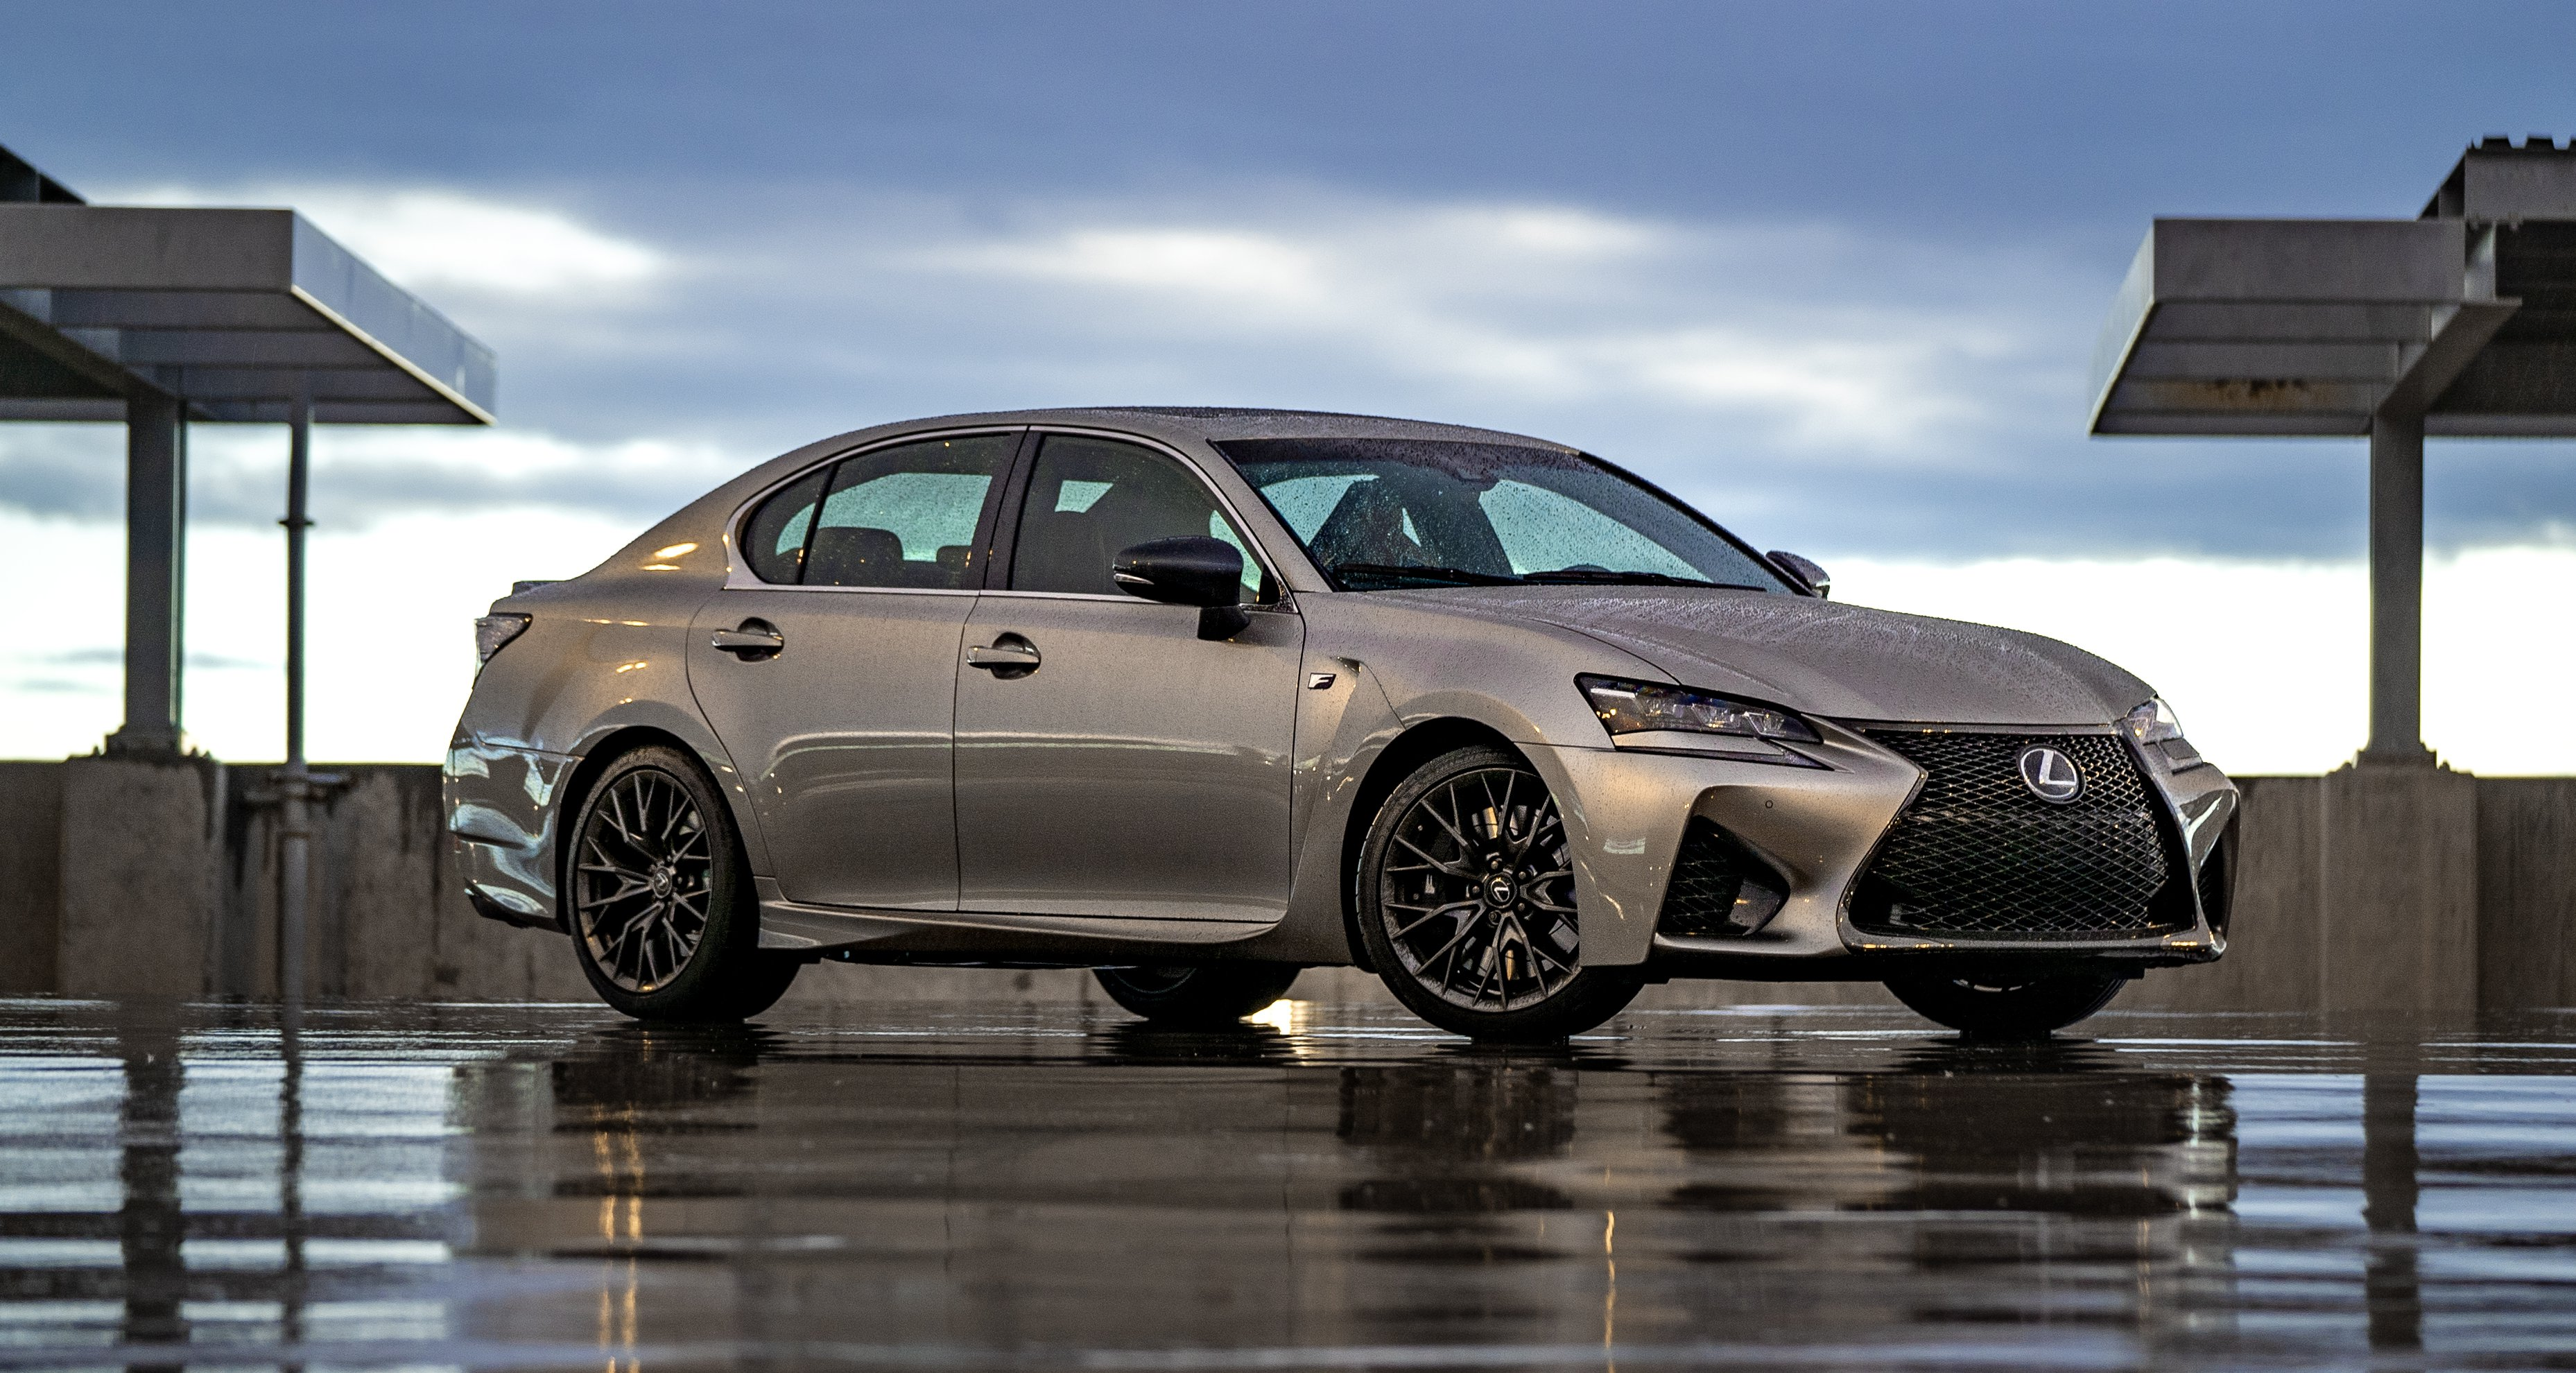 Lexus GS F brings new life into the sports sedan market | Rebecca Nguyen photos